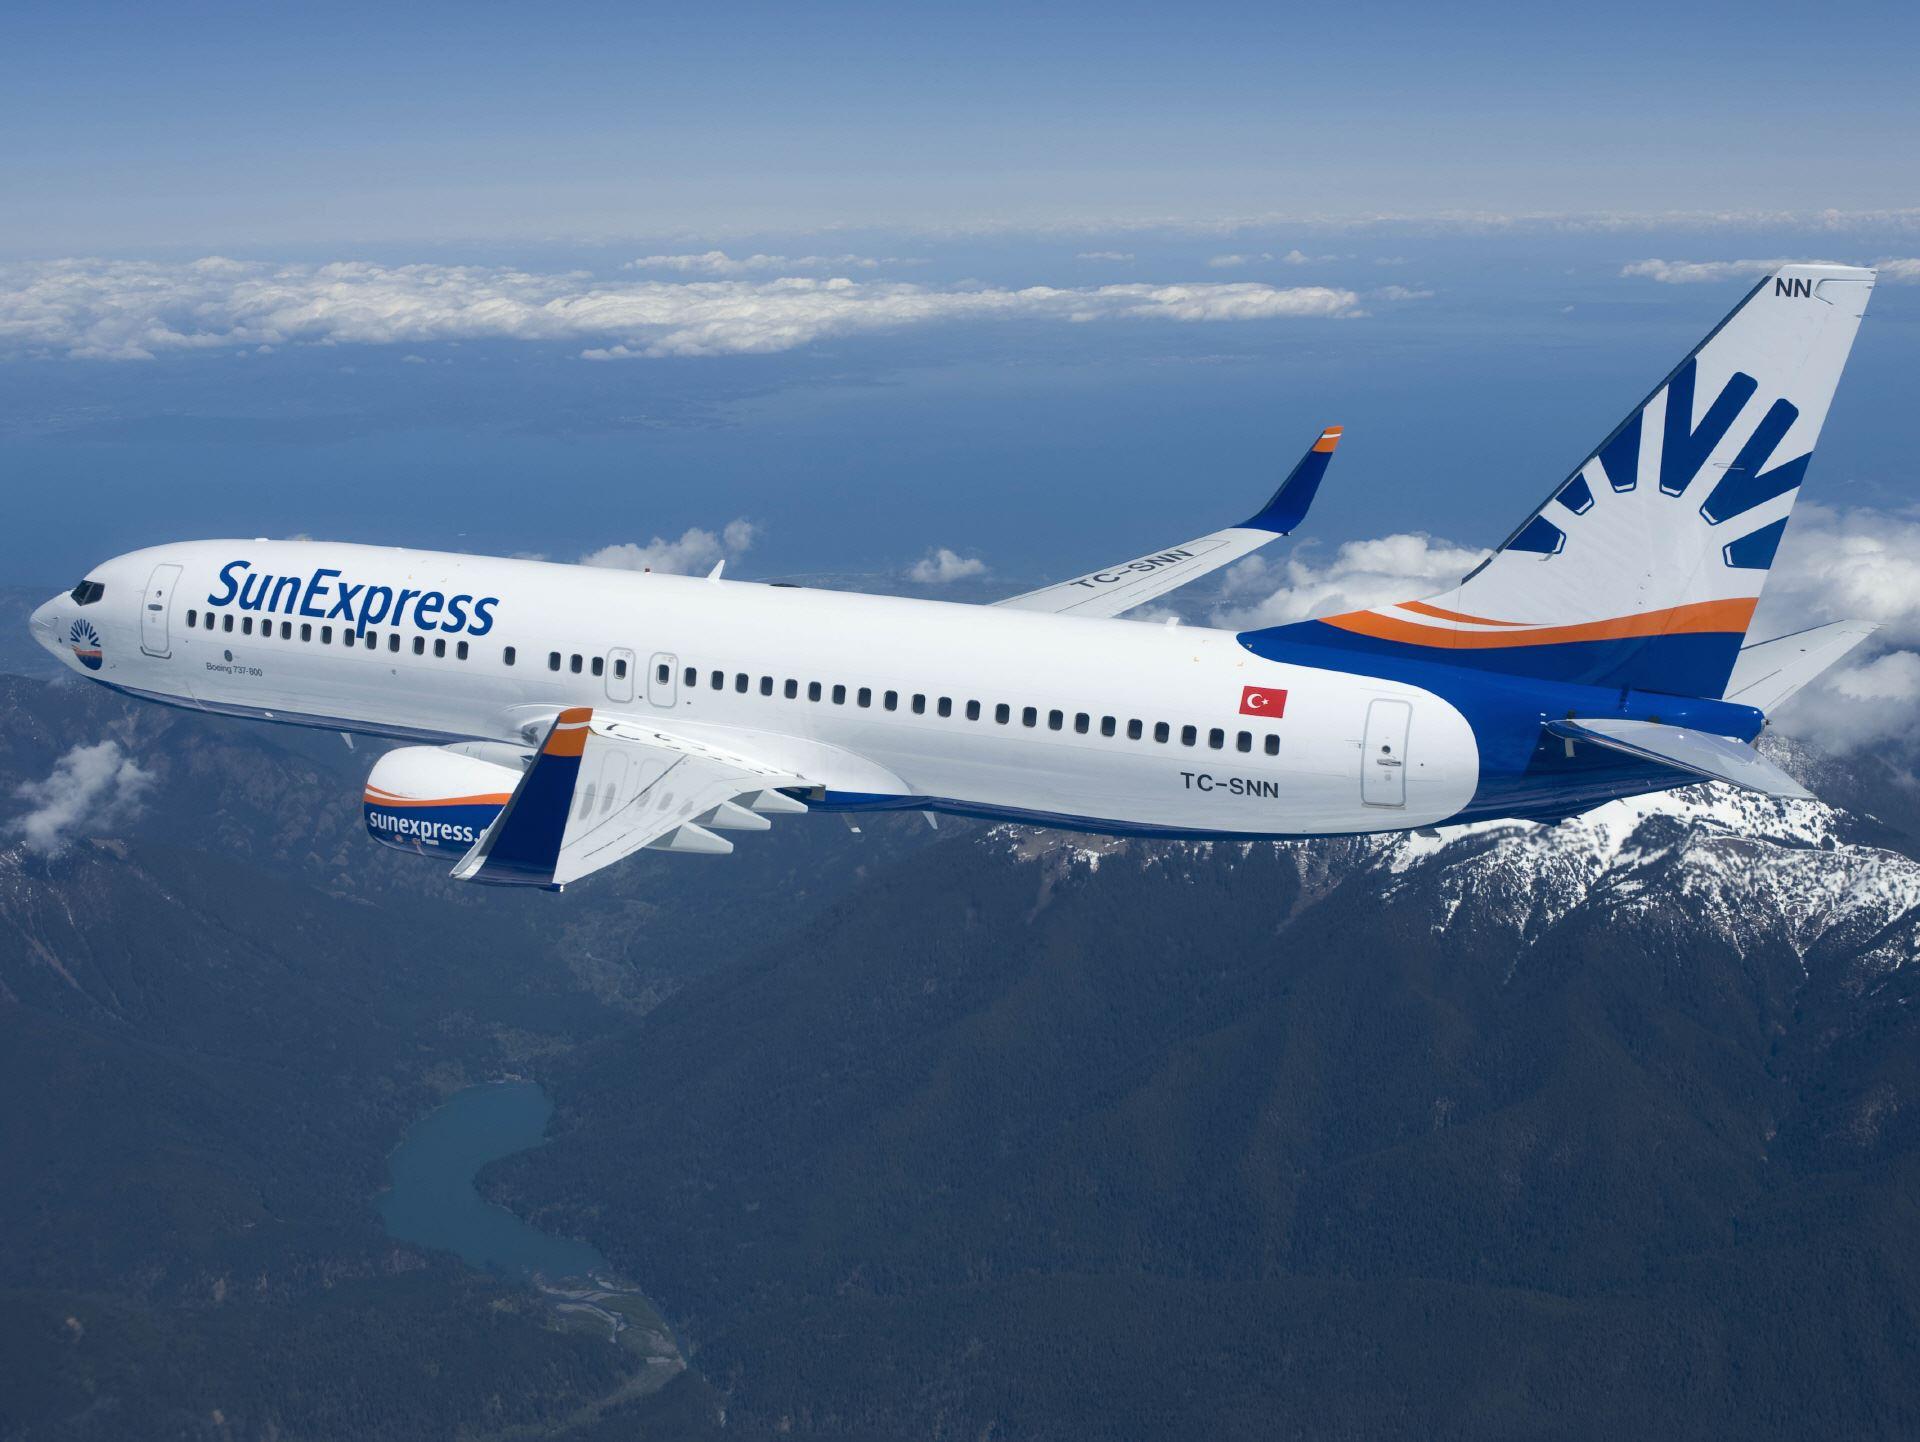 Sunexpress Flugzeug